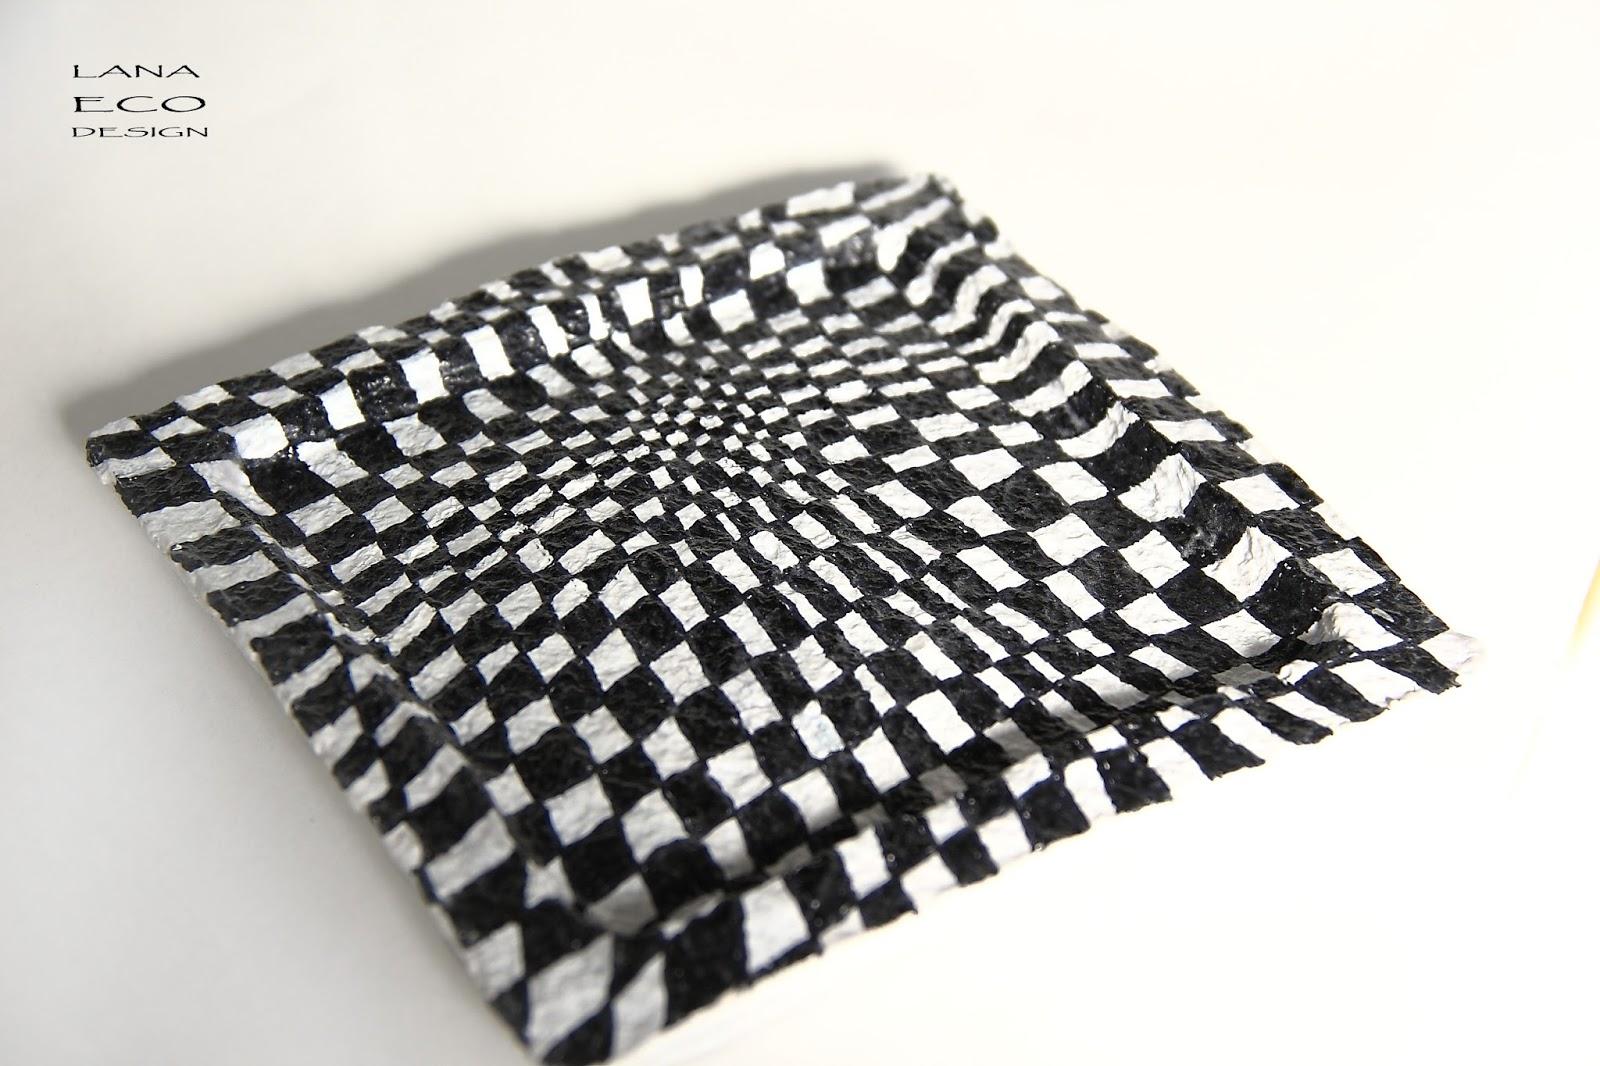 cartapesta-papier-mache-paper-mache-handmade-fatto-a-mano